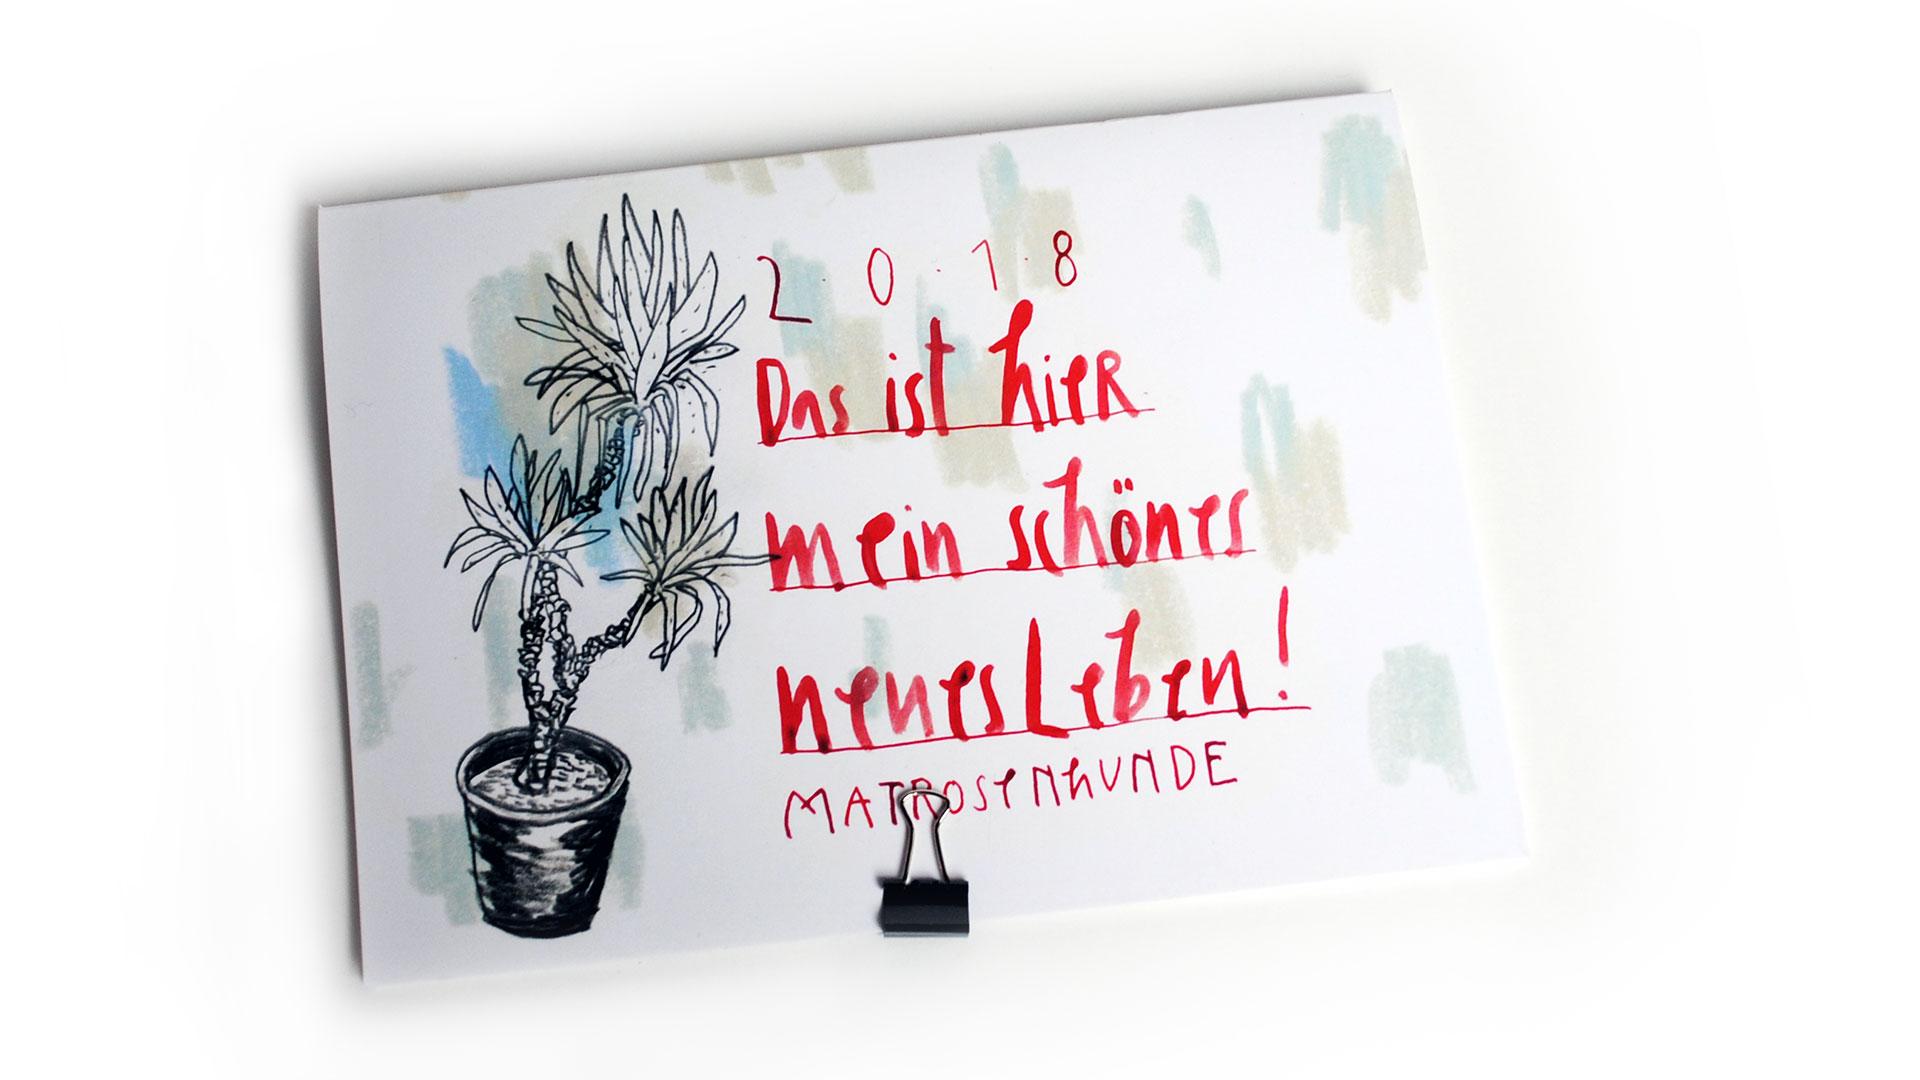 Der Matrosenhunde-Jahreskalender 2018